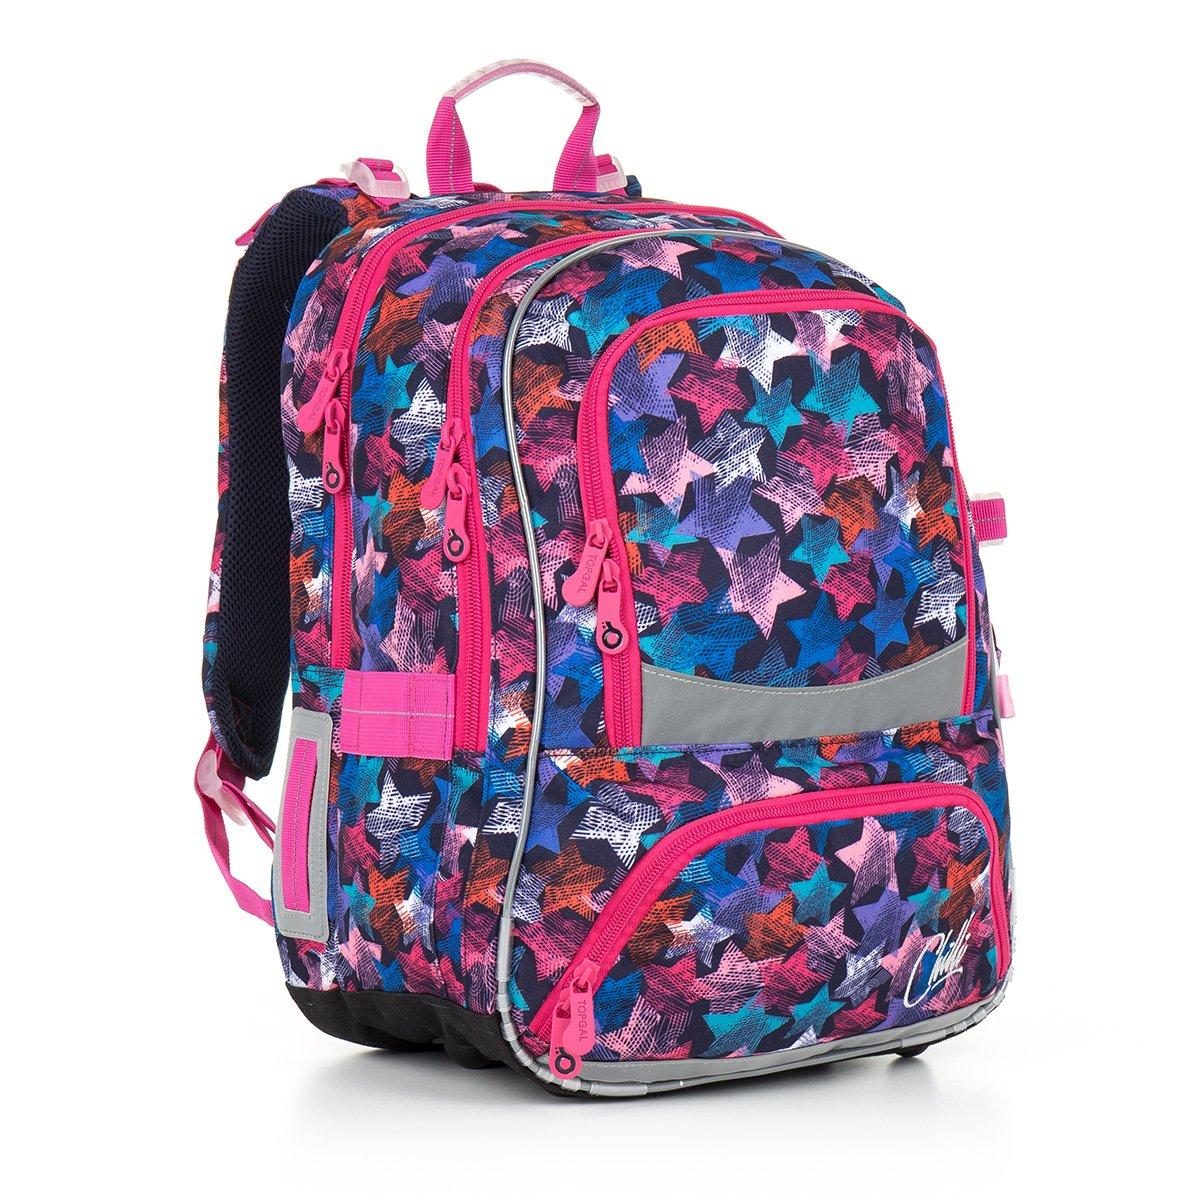 Školní batoh Topgal CHI 867 D - Blue